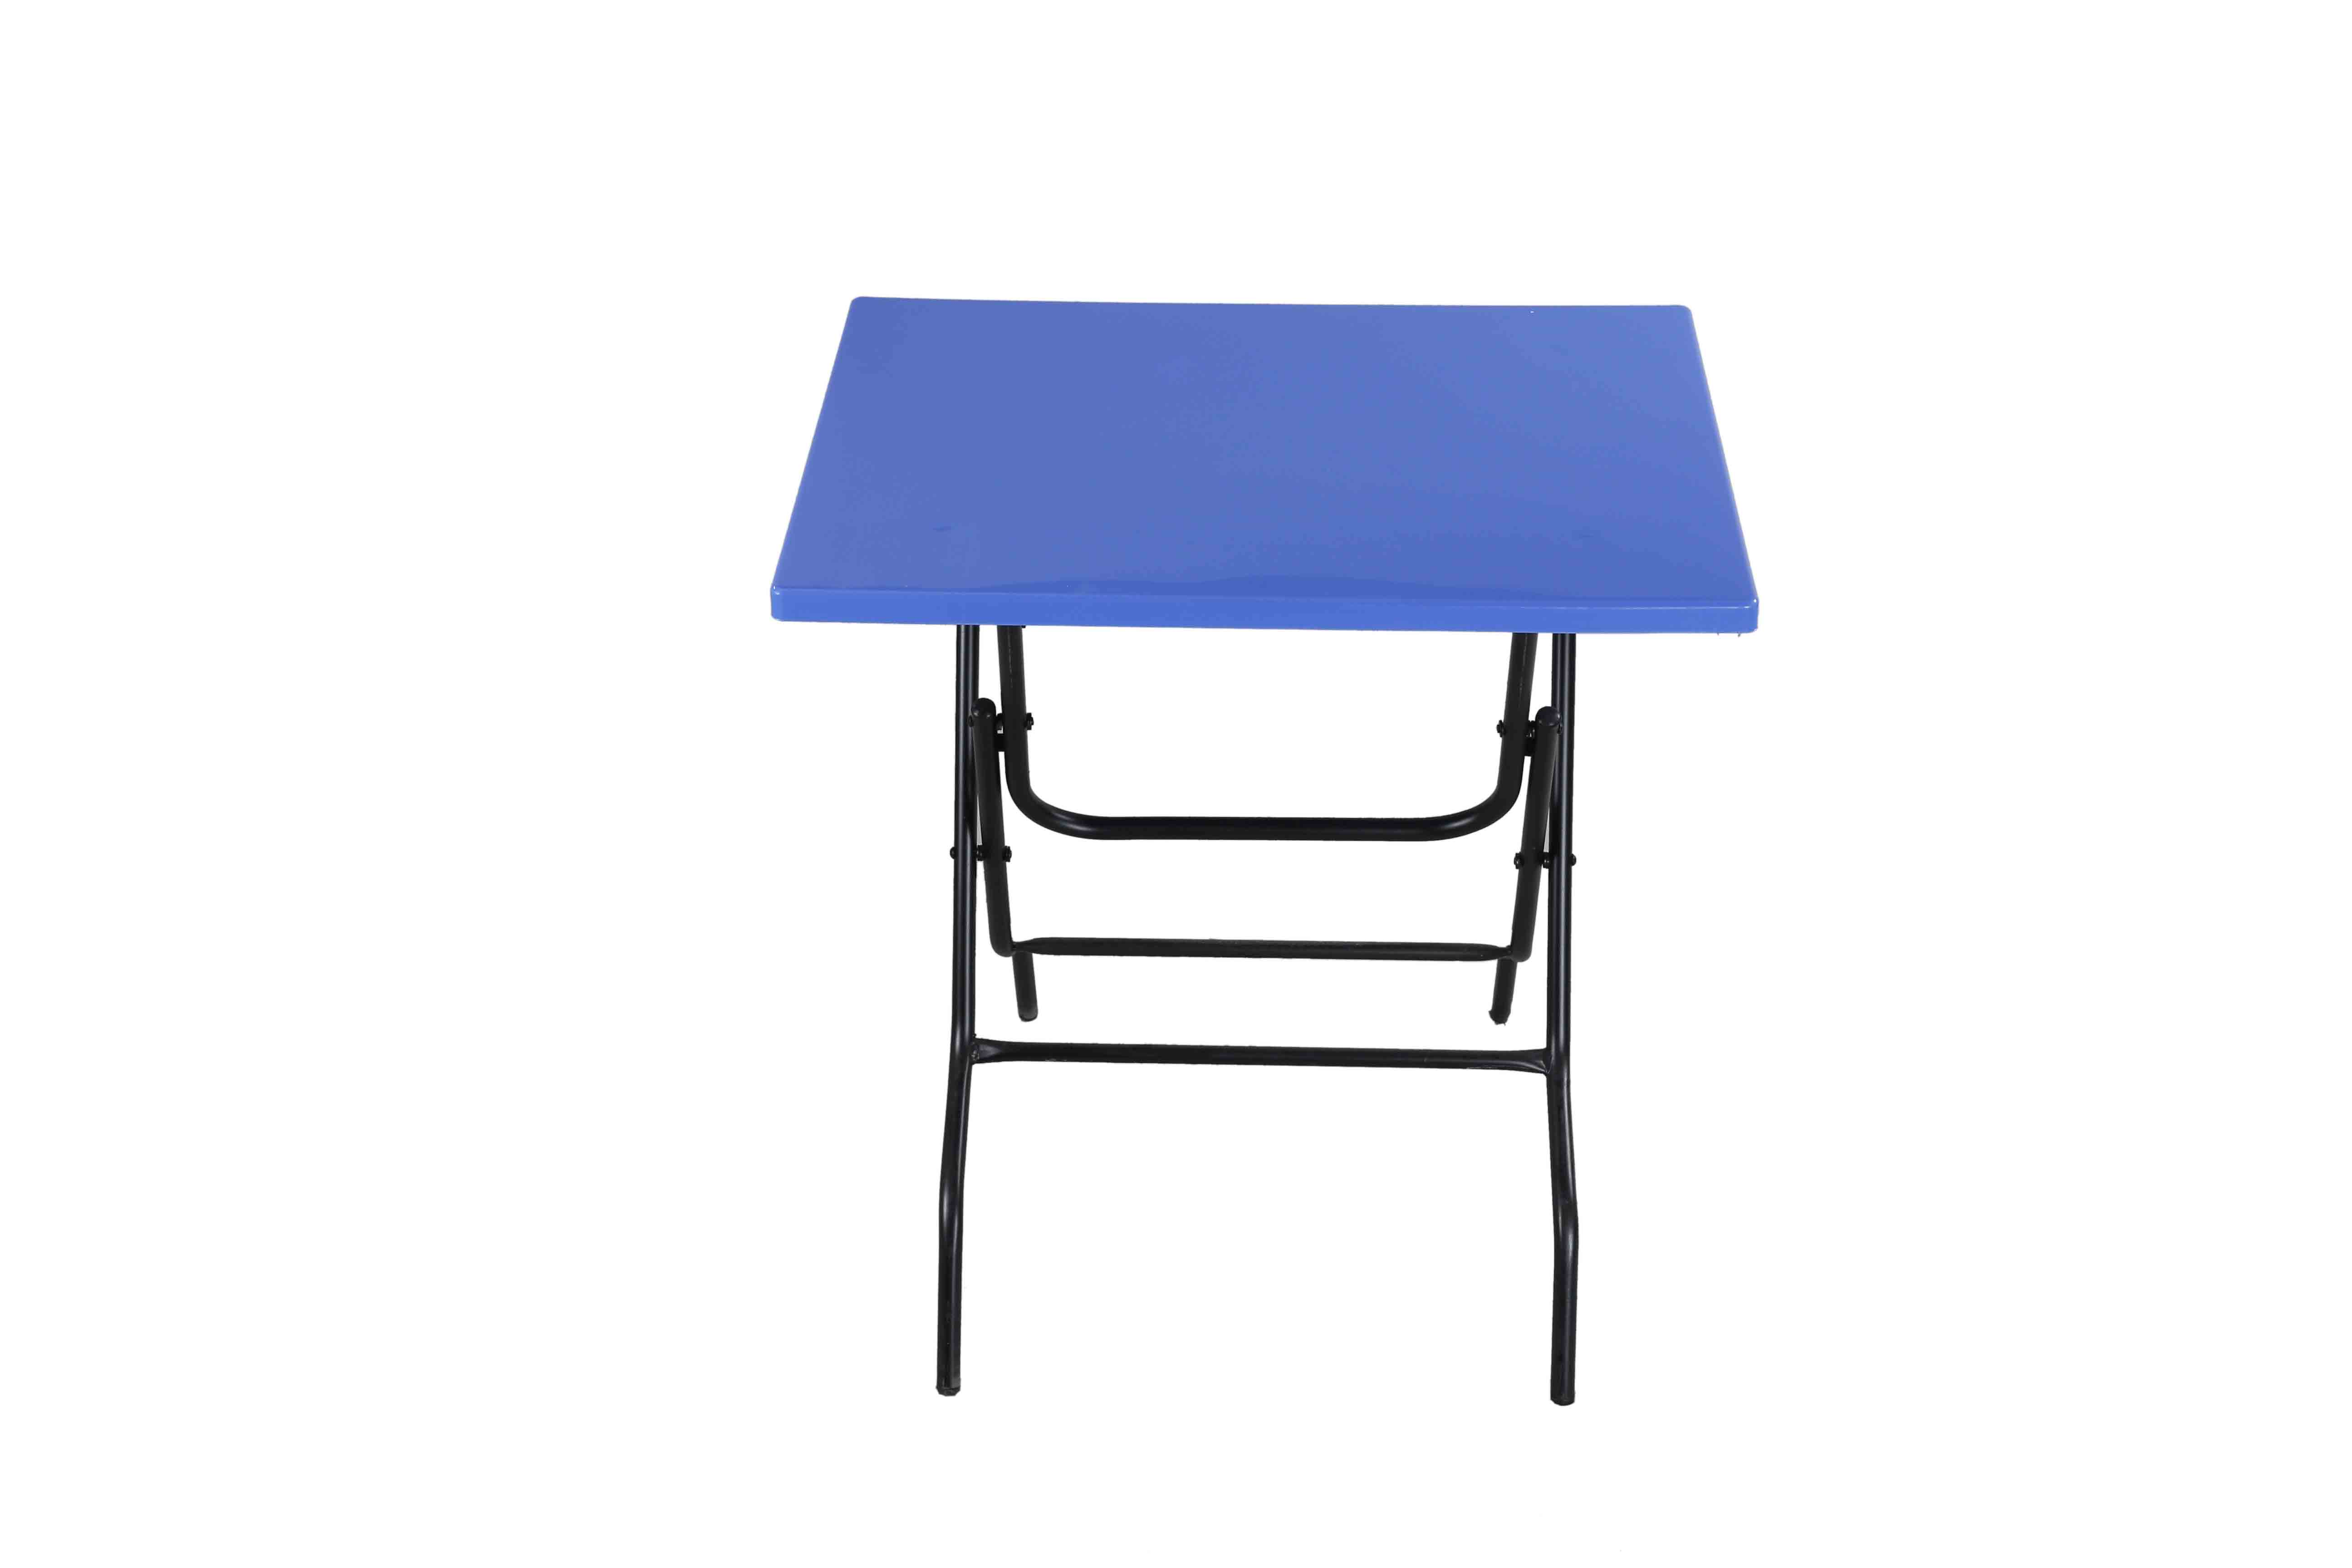 Restaurant Table Two Seat St/Leg – SM Blue